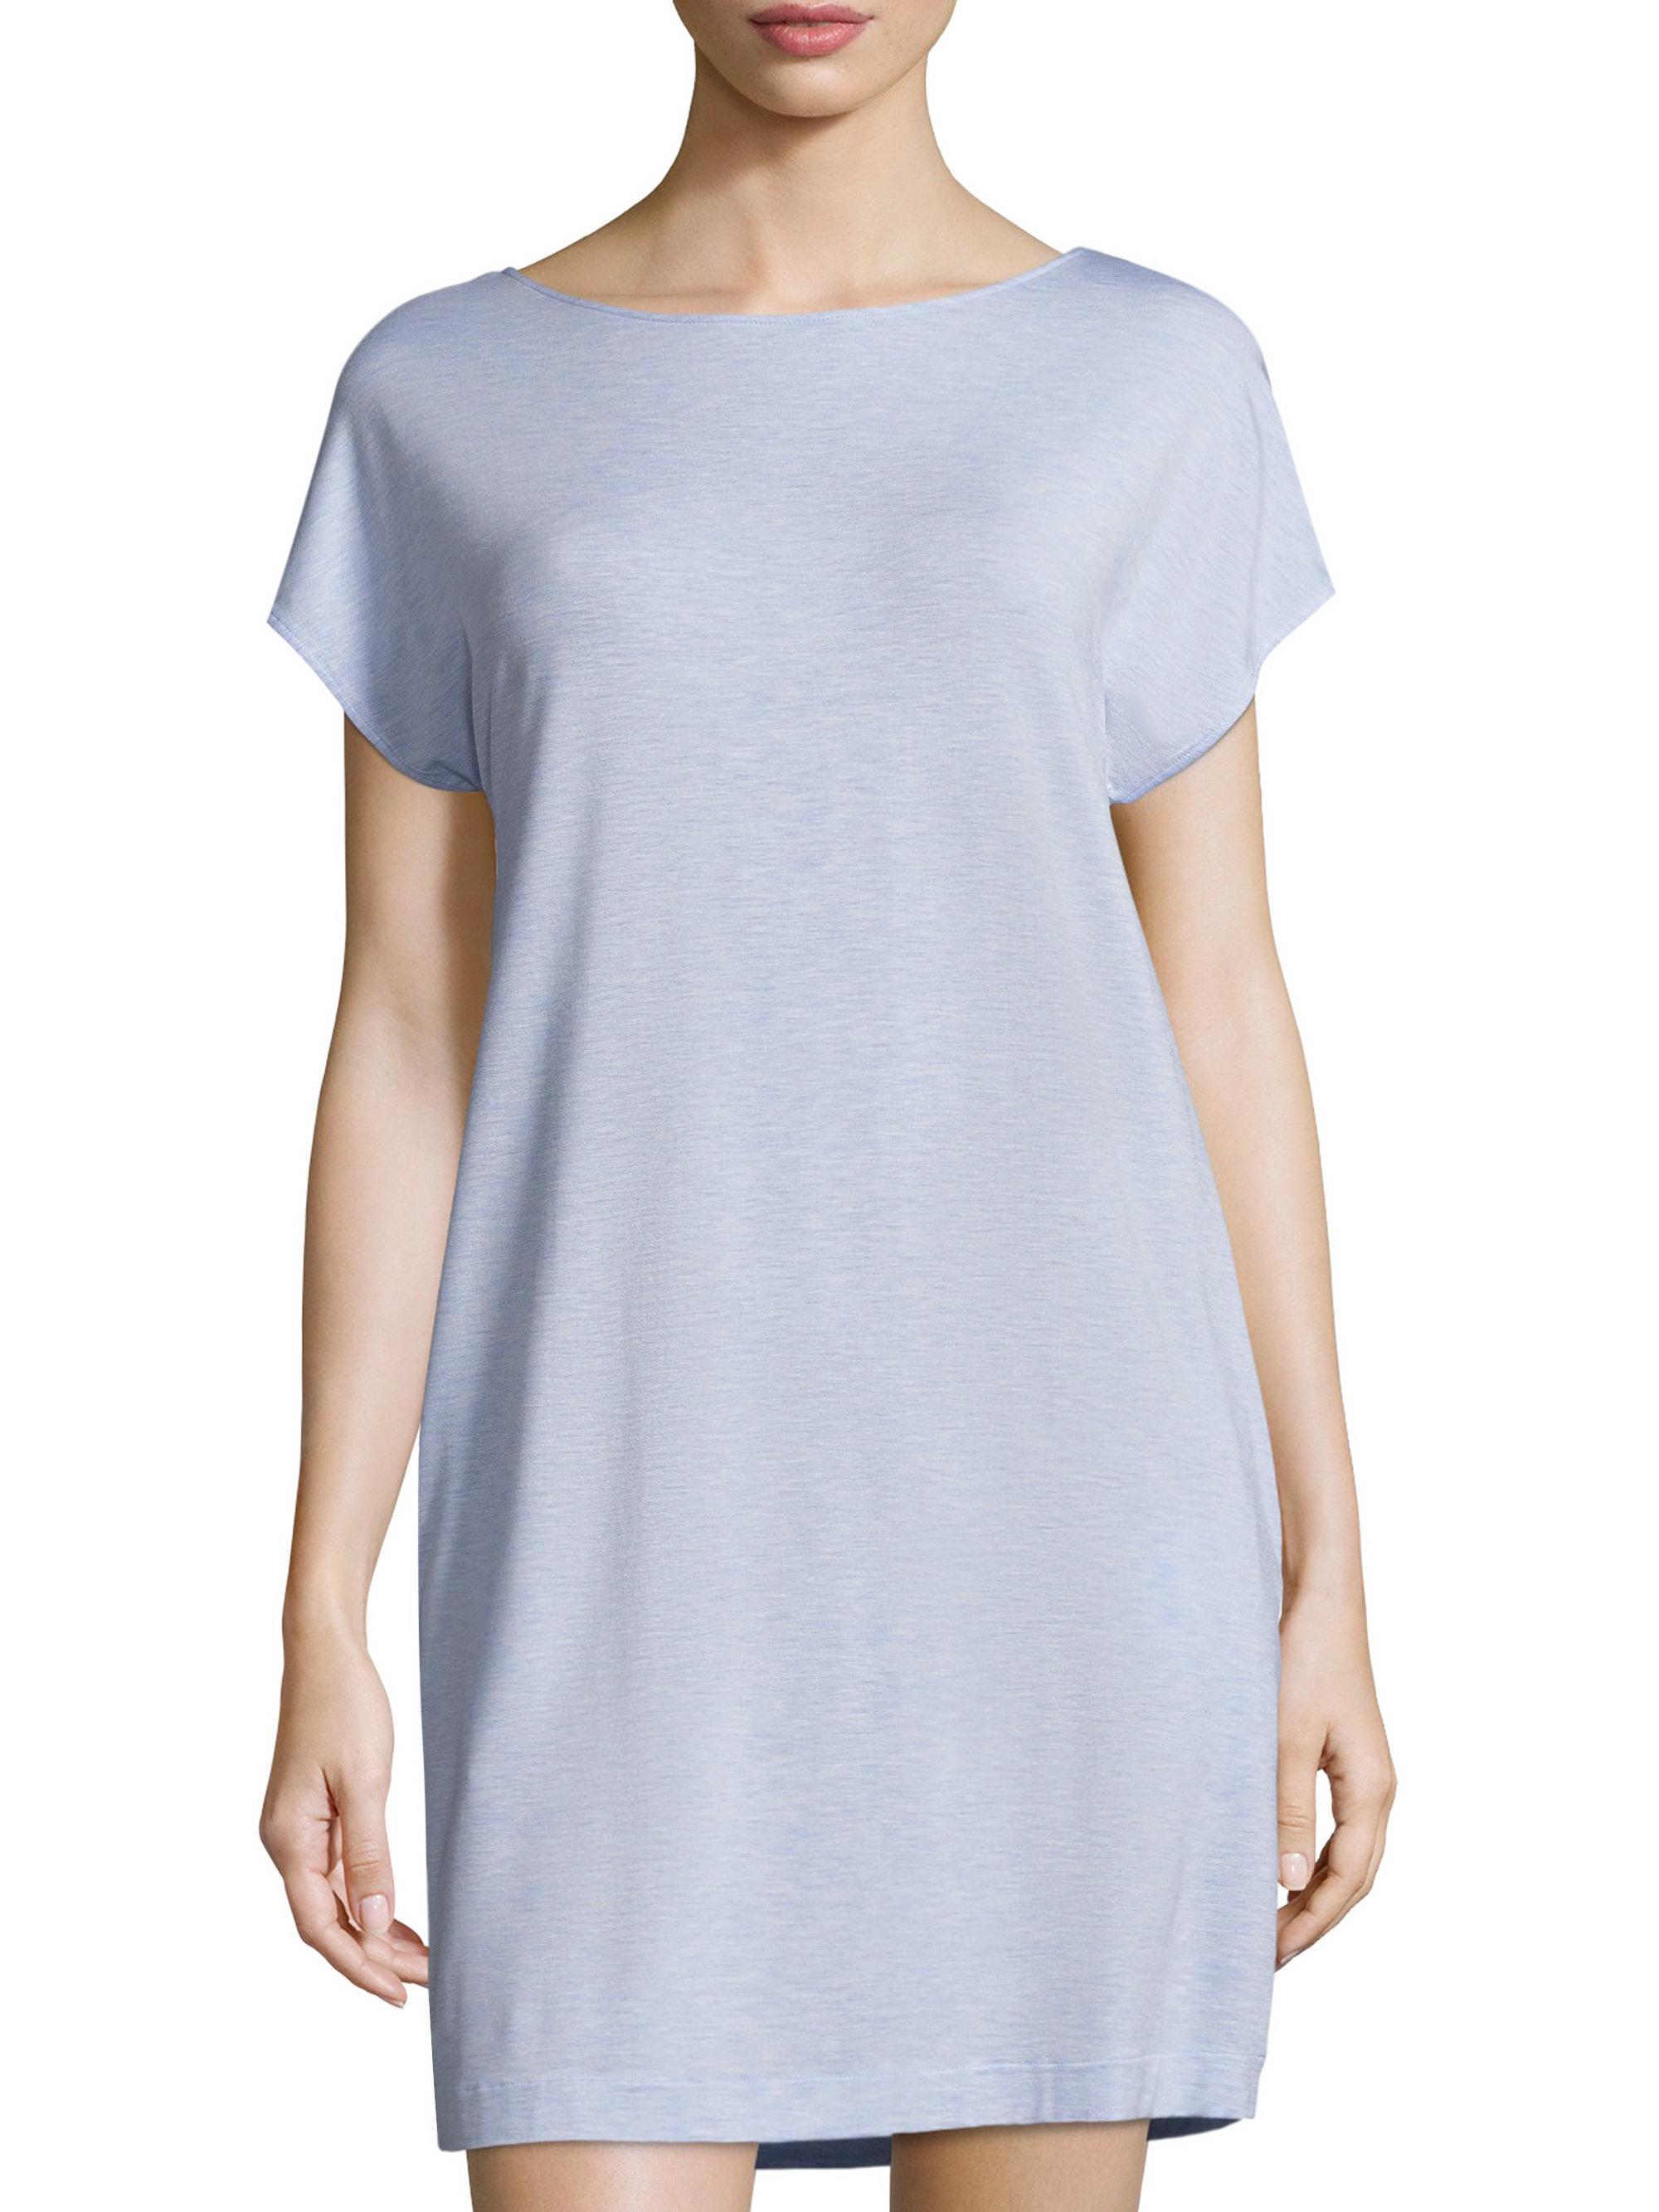 d9f0f4fdbf Hanro Natural Elegance Short Sleeve Nightgown in Blue - Lyst